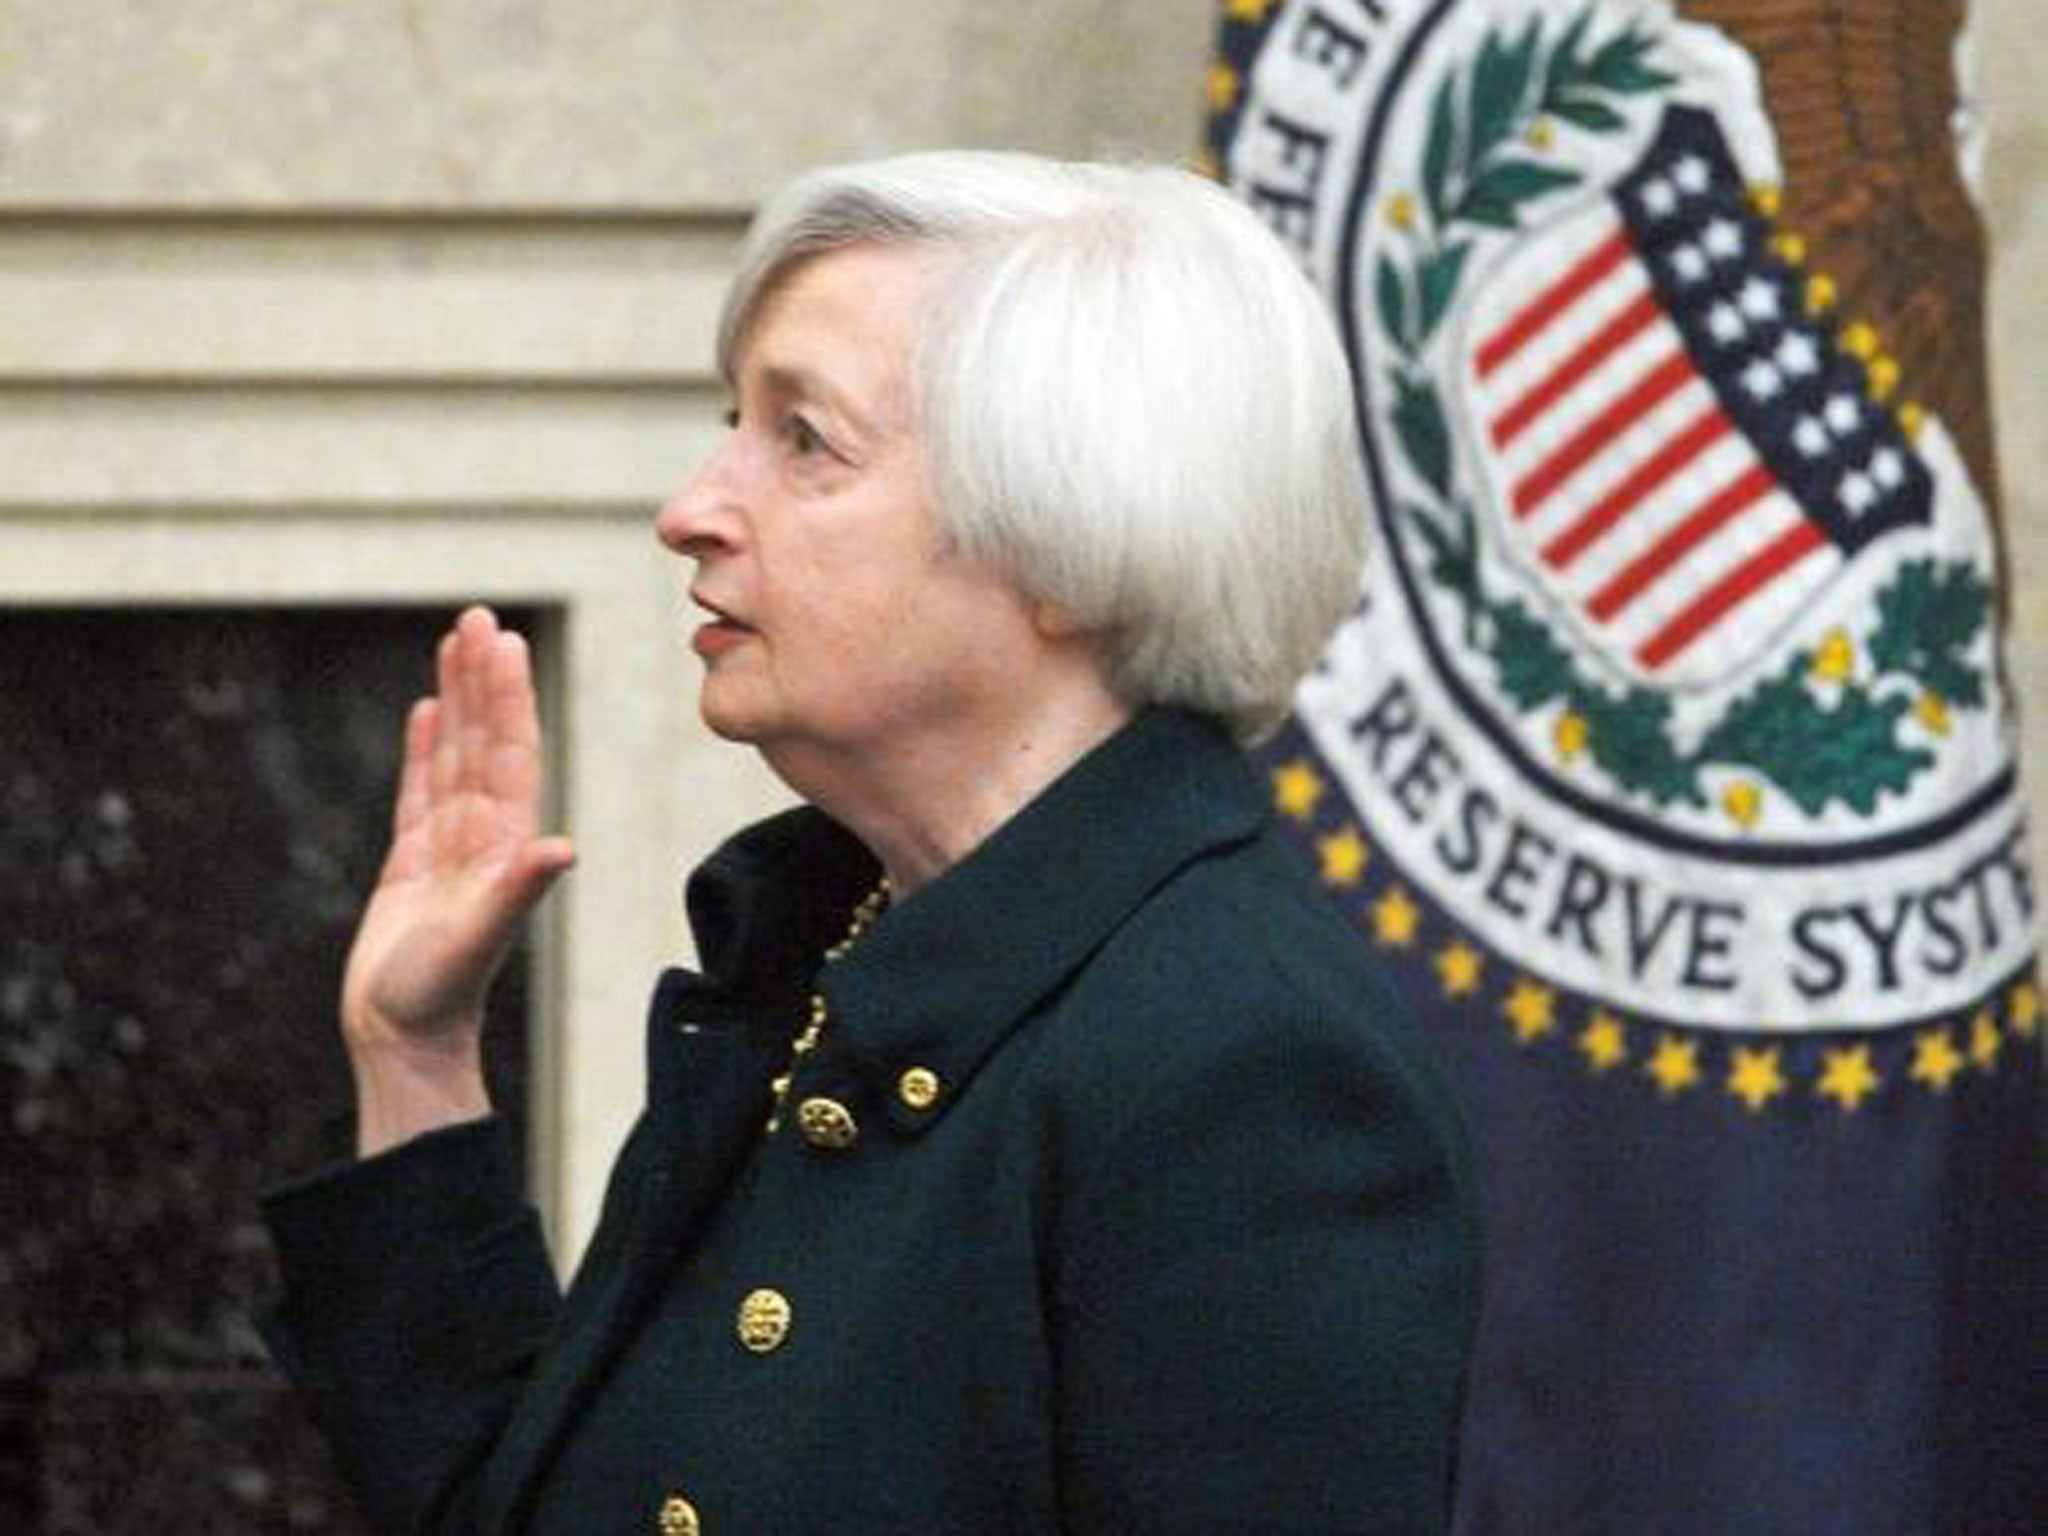 biden cabinet janet yellen set to become first female treasury secretary the independent biden cabinet janet yellen set to